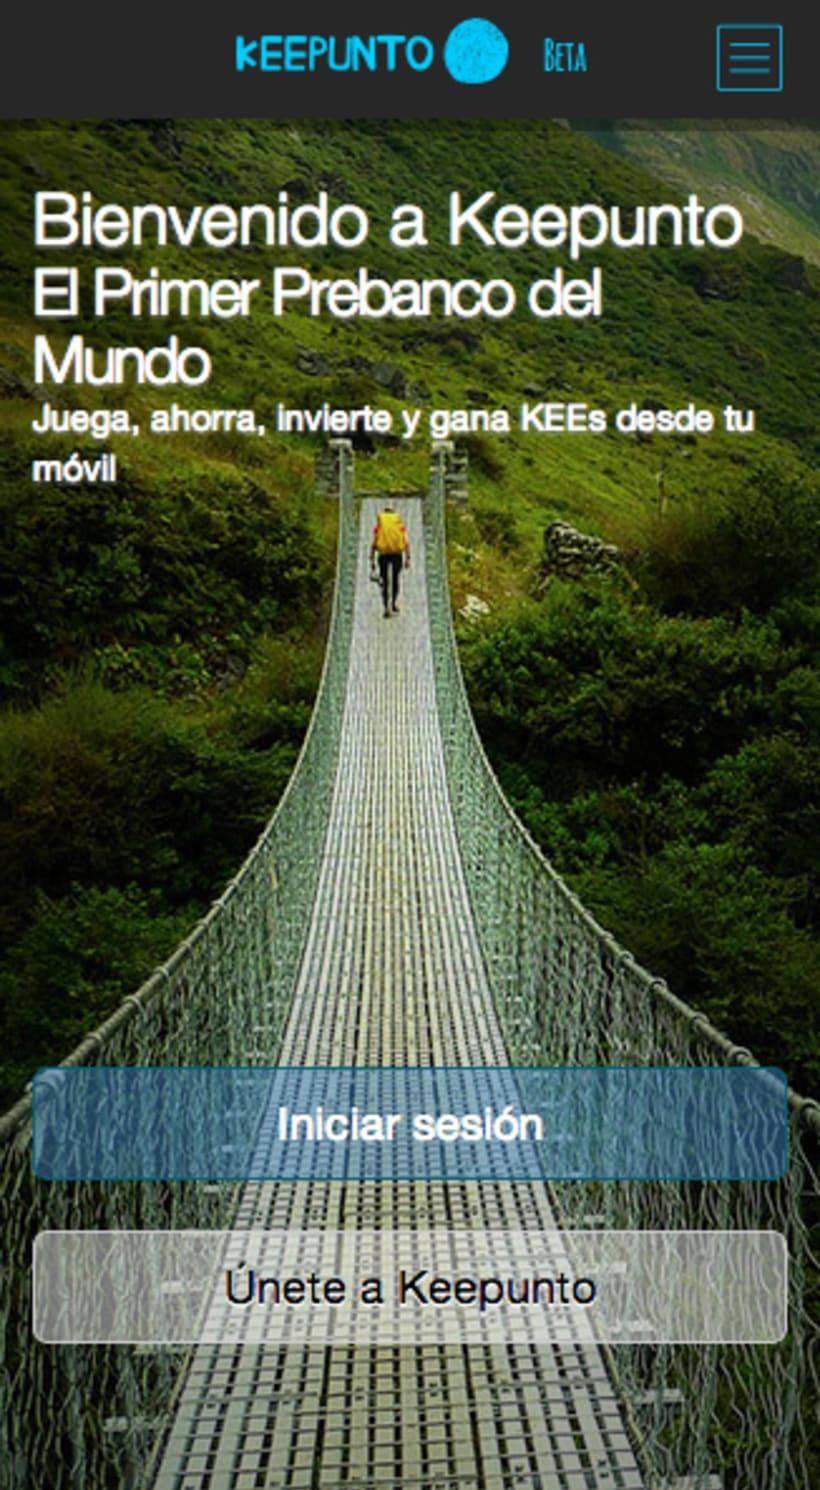 Keepunto Diseño Movil (web mobile) 1